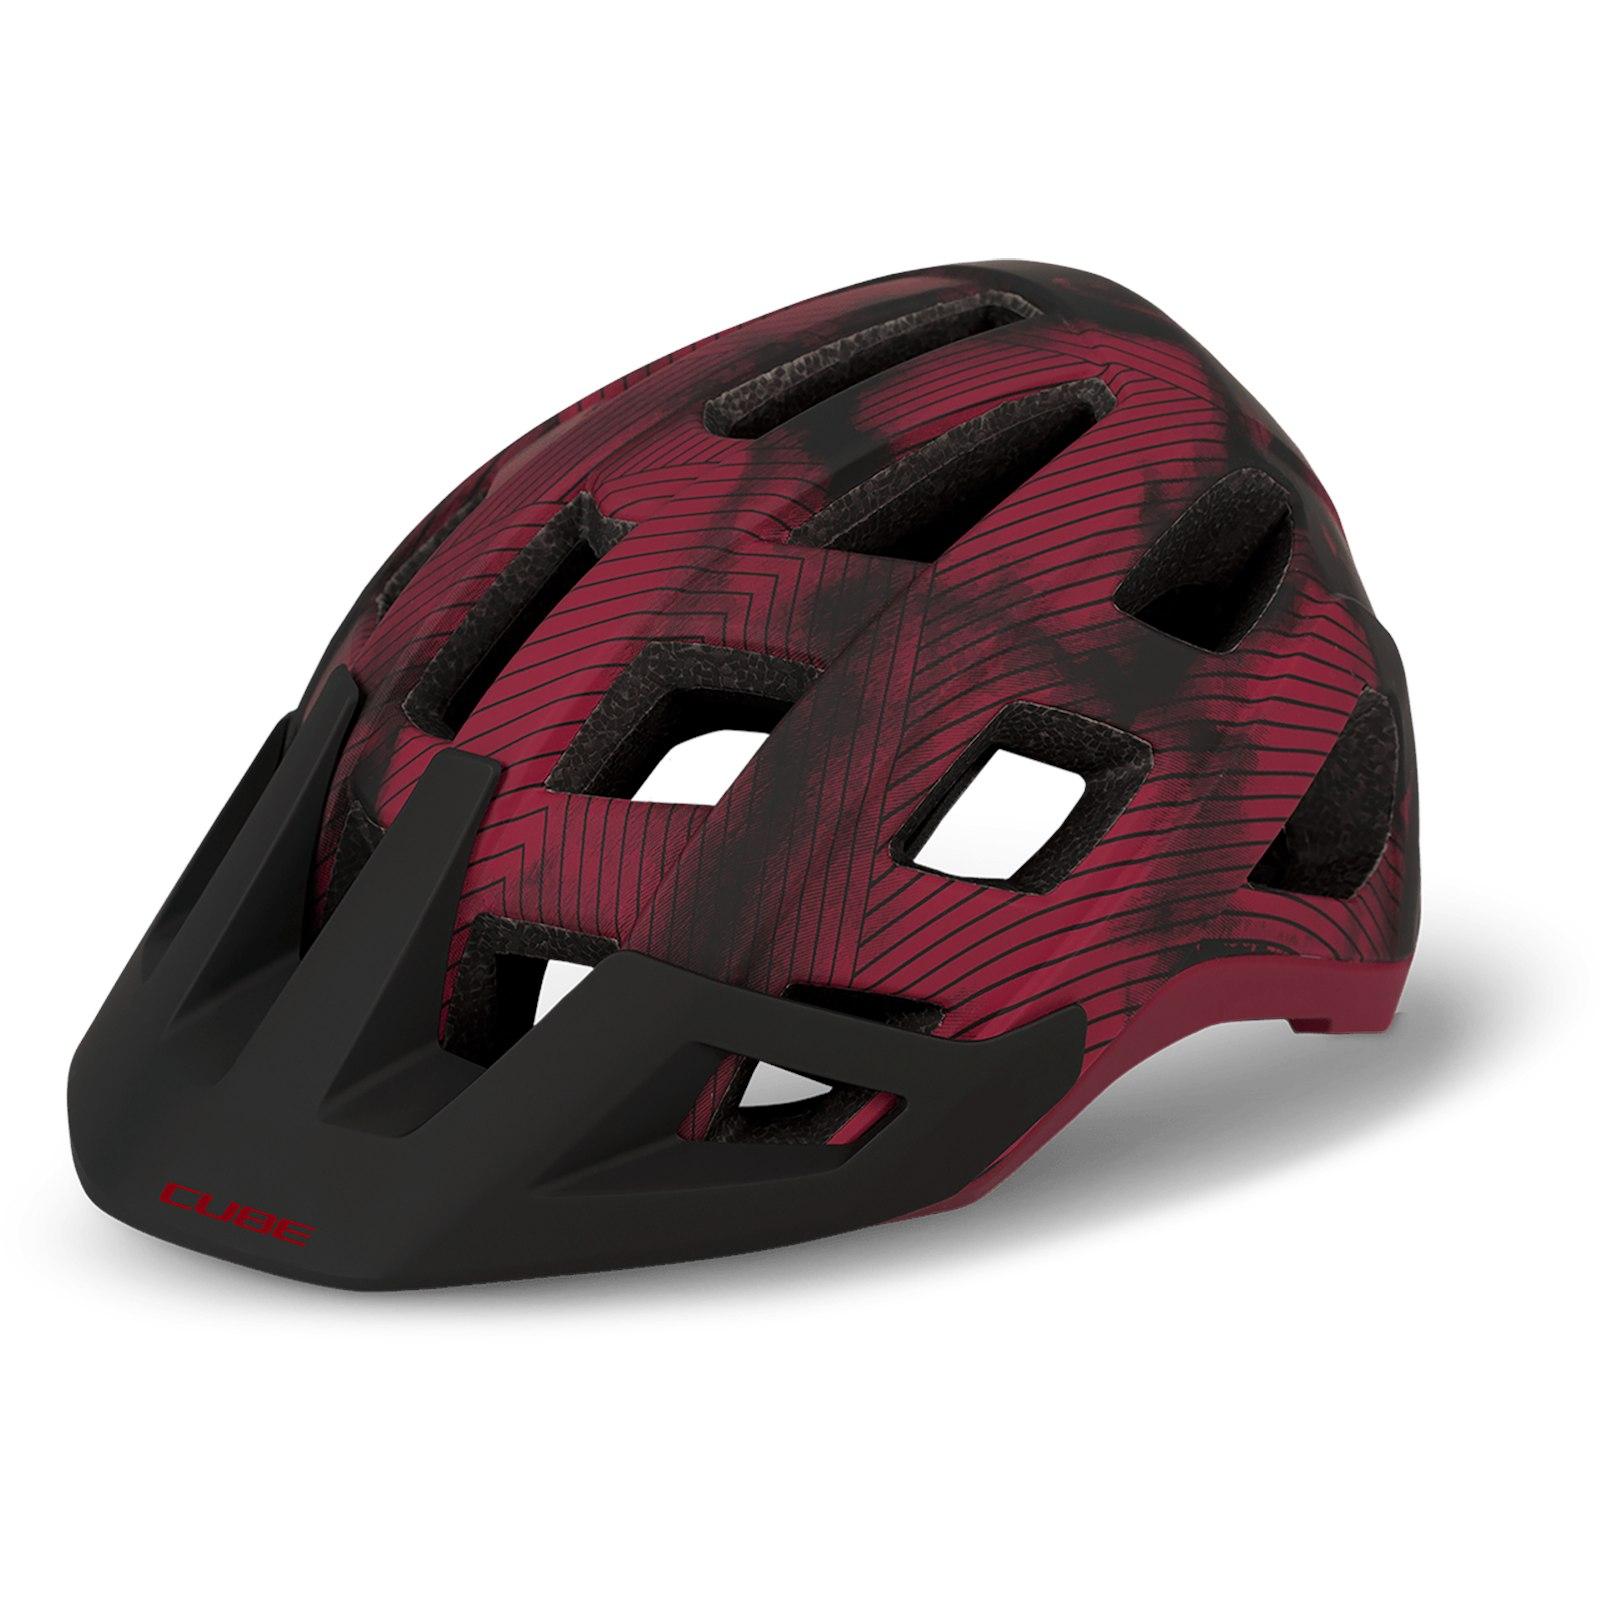 CUBE Helmet BADGER - red